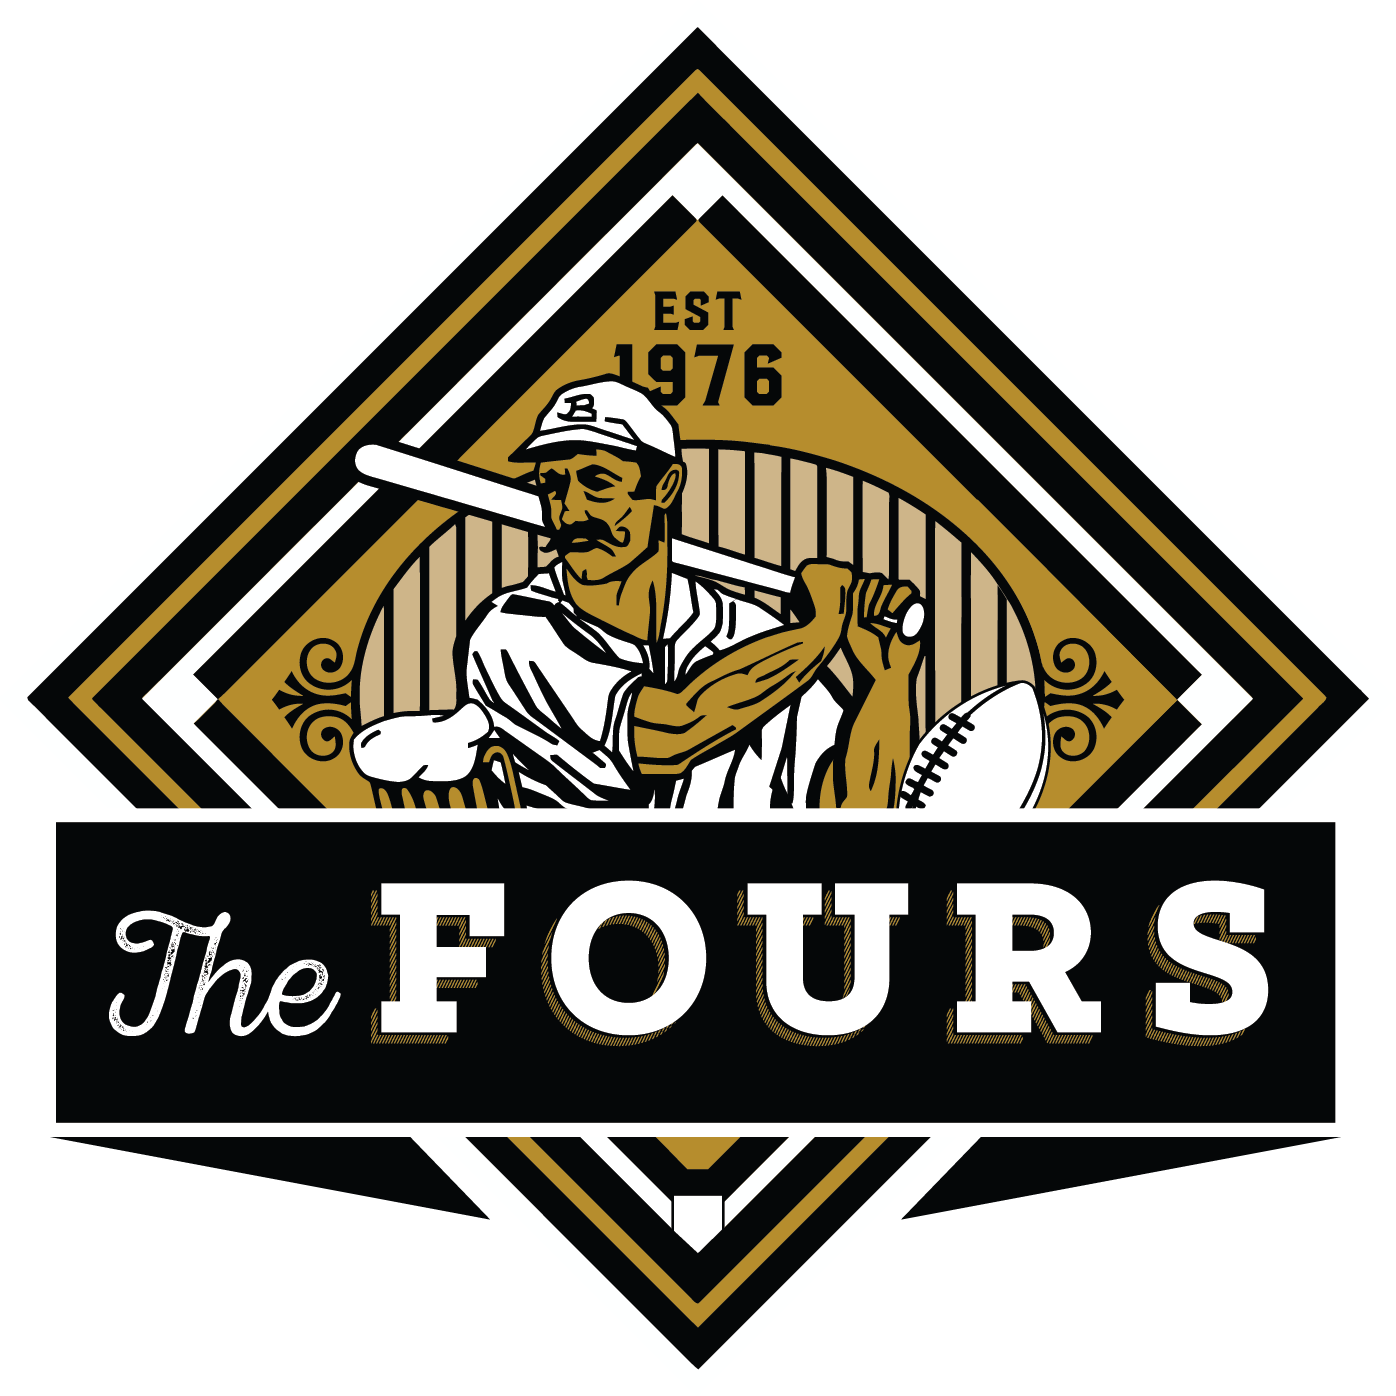 Boston — The Fours Restaurant & Sports Bar Sports bar